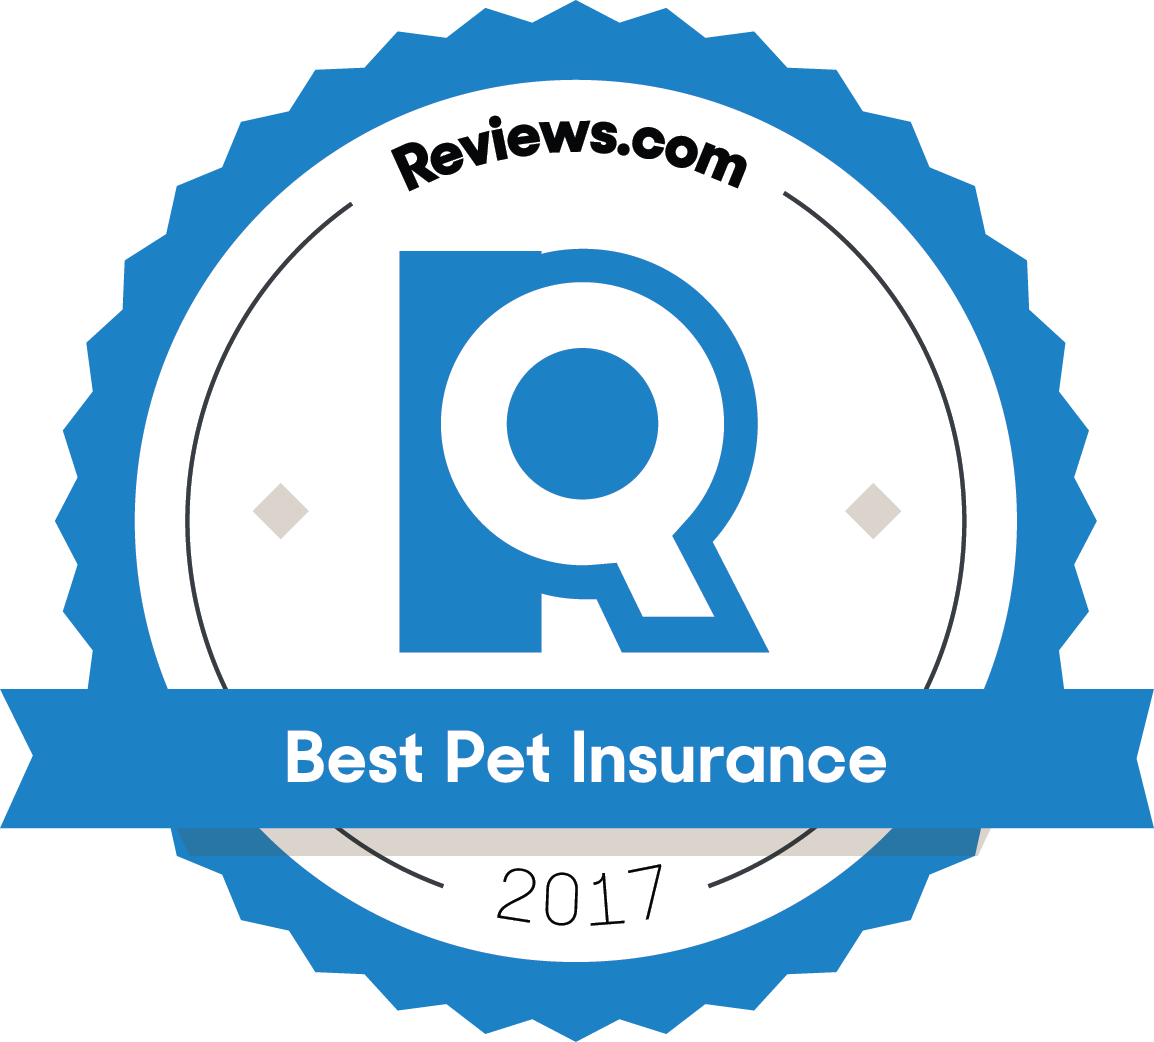 The Best Pet Insurance Best Pet Insurance Home Security Systems Pet Insurance